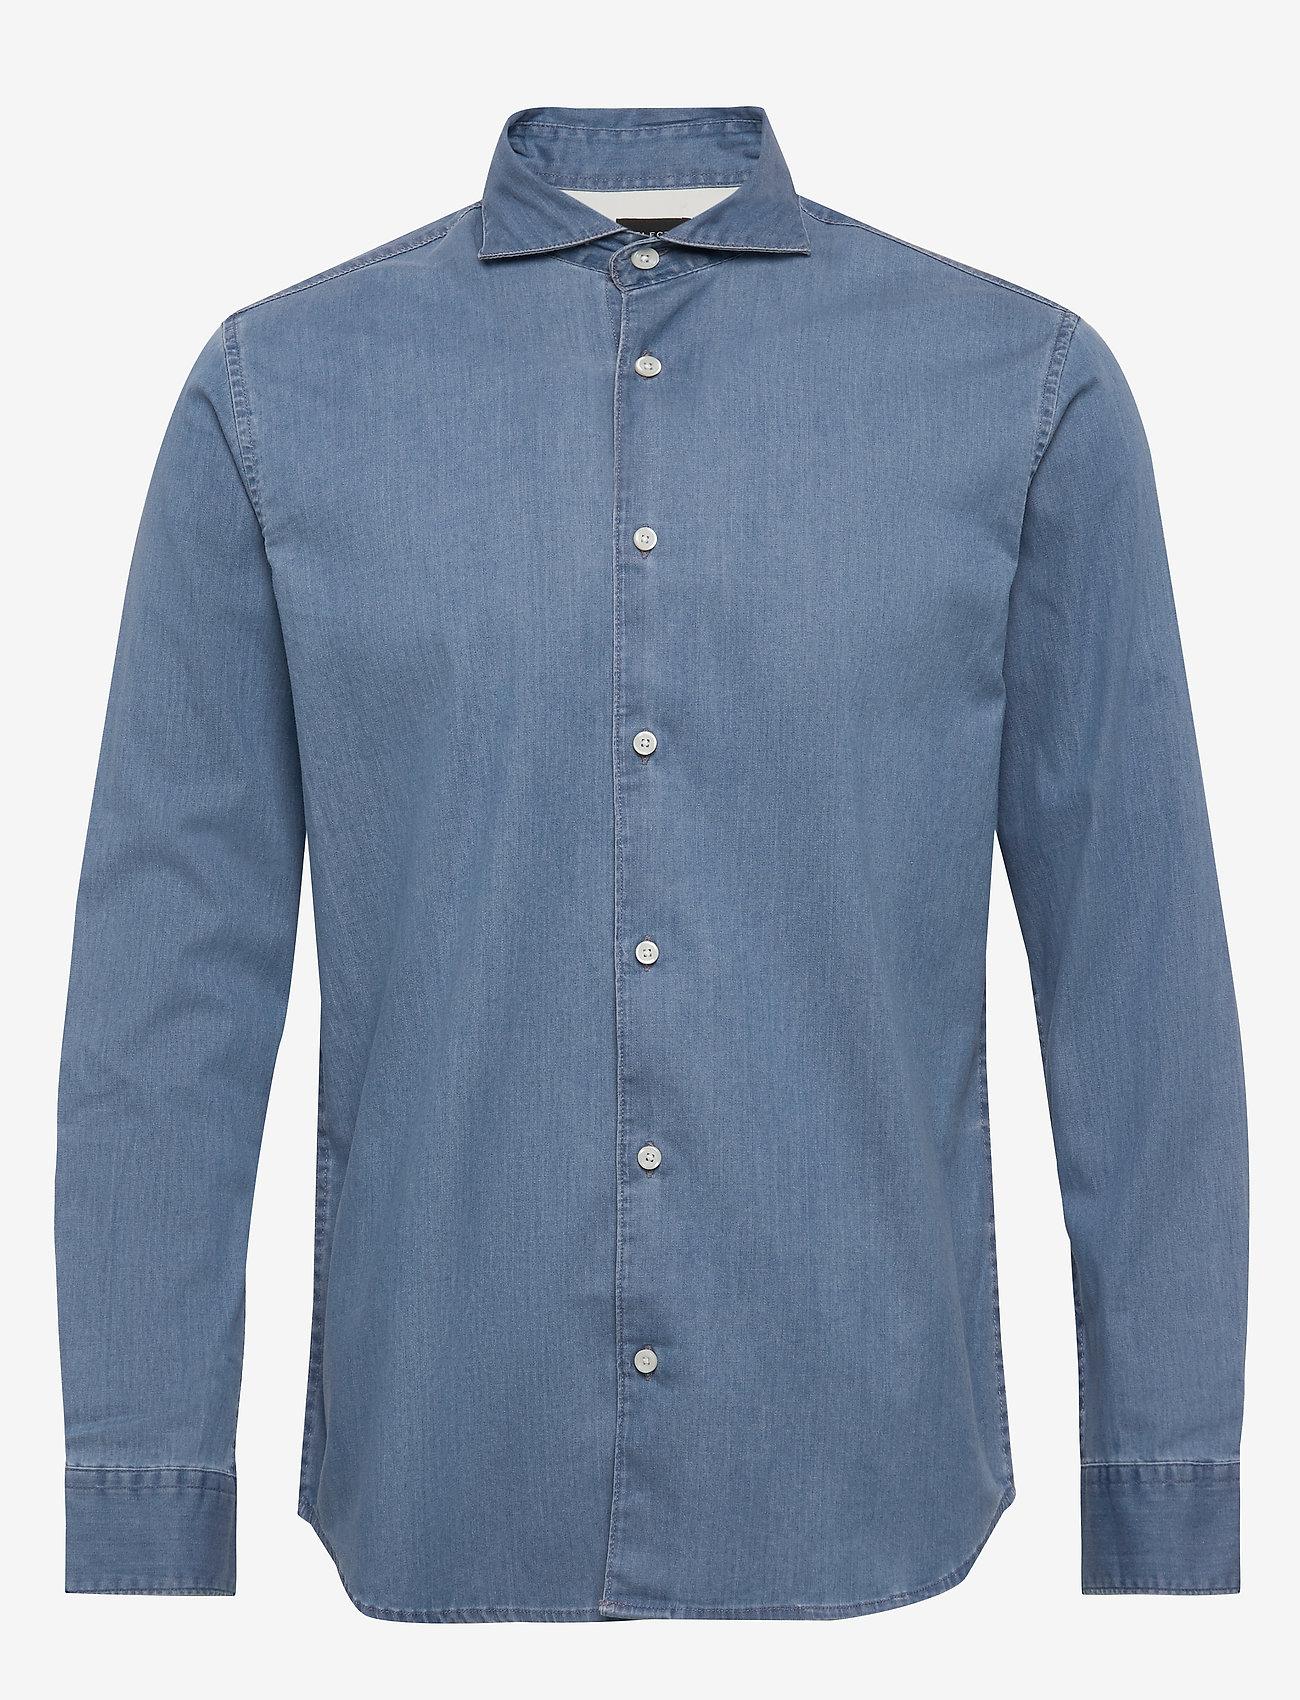 Selected Homme - SLHREGSEL-NOOR SHIRT LS B NOOS - podstawowe koszulki - medium blue denim - 0